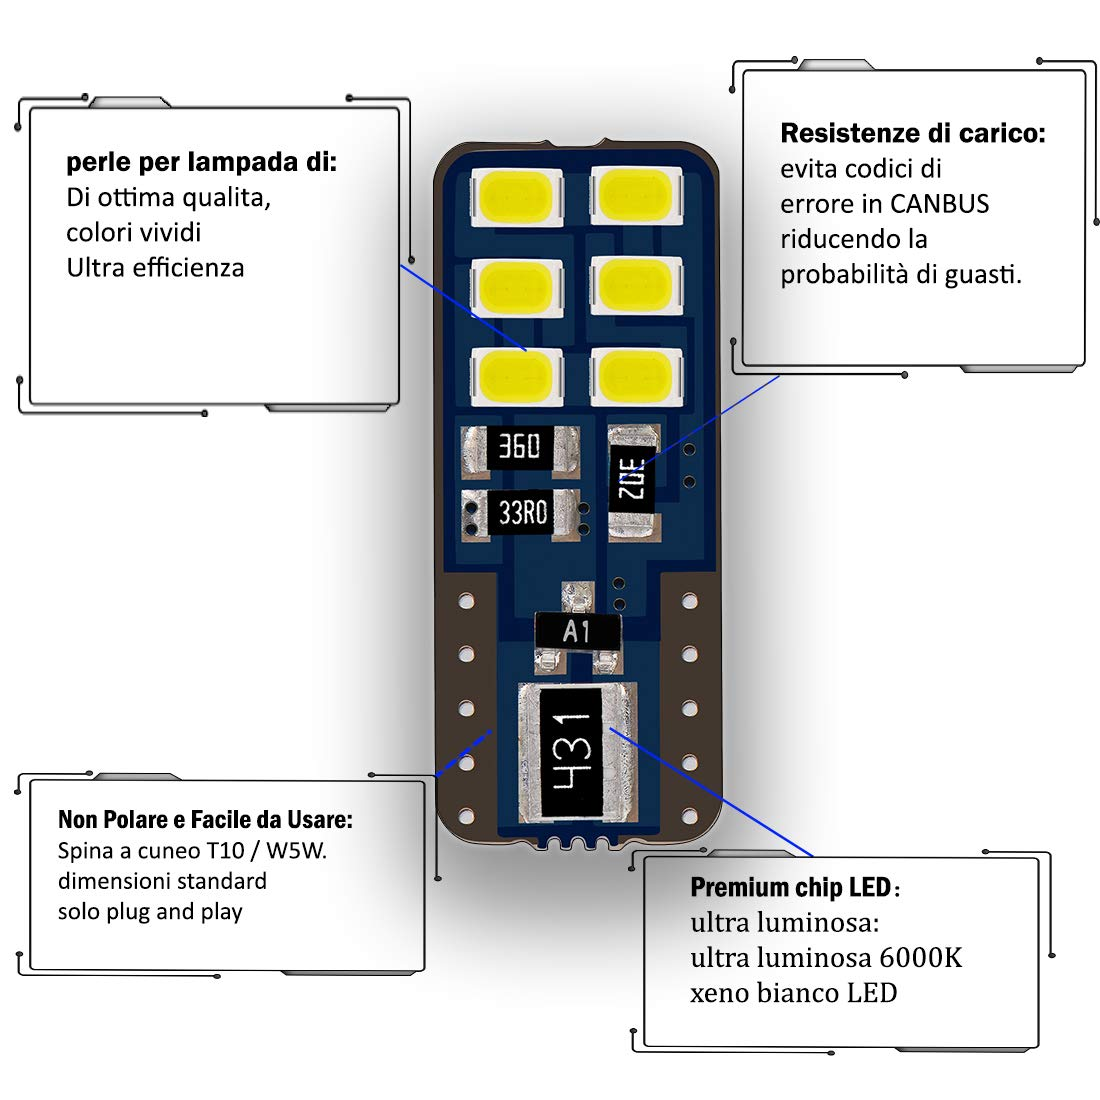 XELORD T10 W5W LED CANBUS no error cuneo lampadine 194 168 6000K Bianco 12V Per Auto Interni Luce Targa Luce di Posizione, Luce di Indicatore Laterale Replacement,4 Pezzi